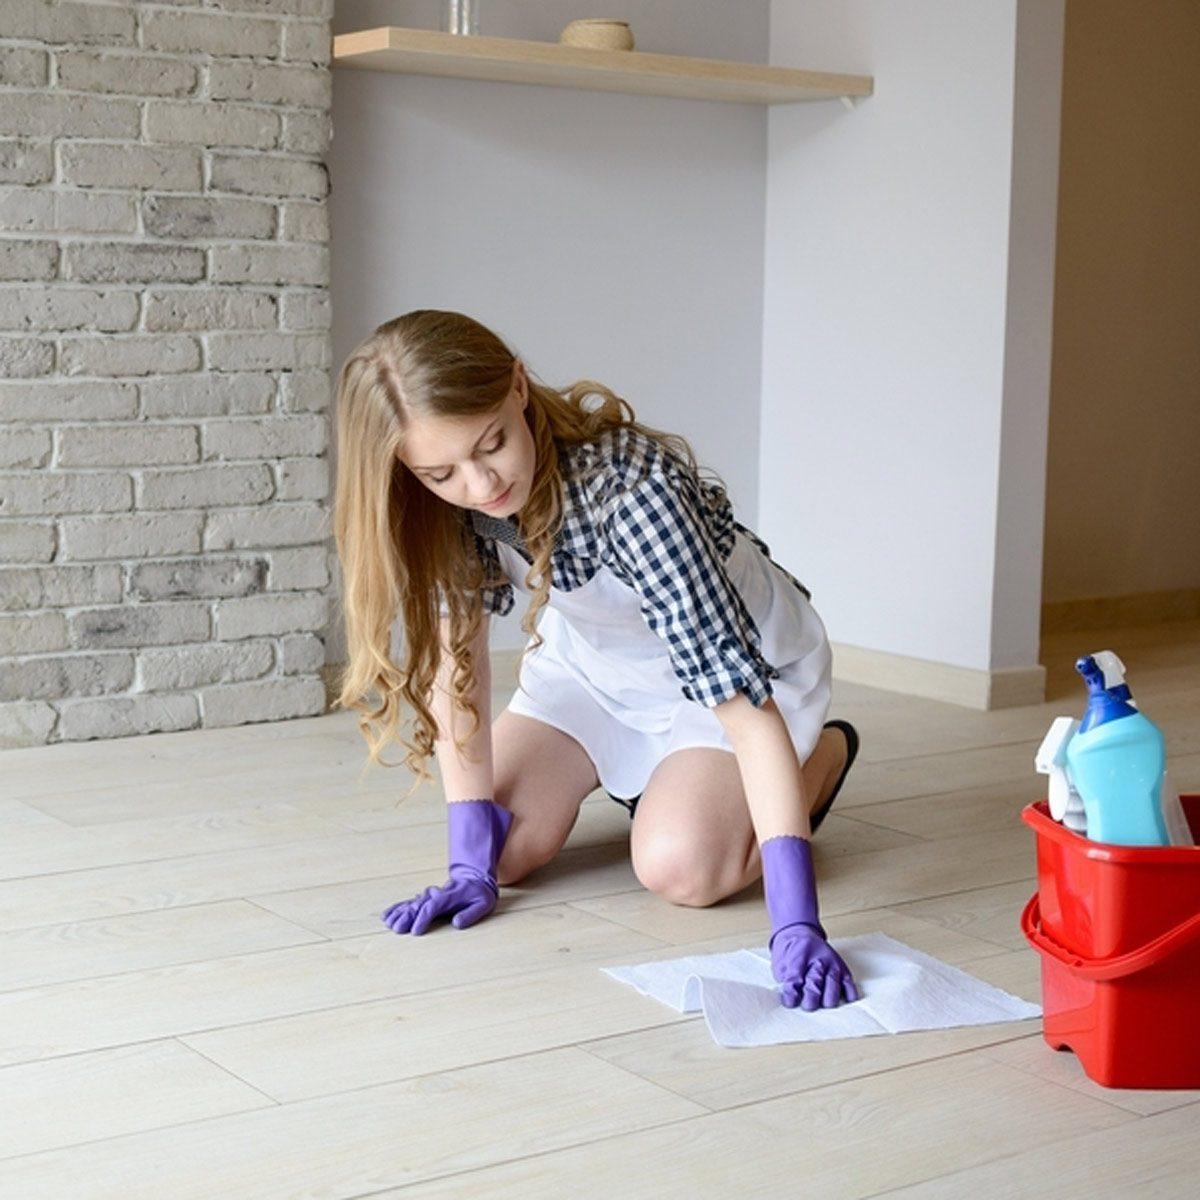 dfh5_shutterstock_366760406 clean the wood floor finish restorer